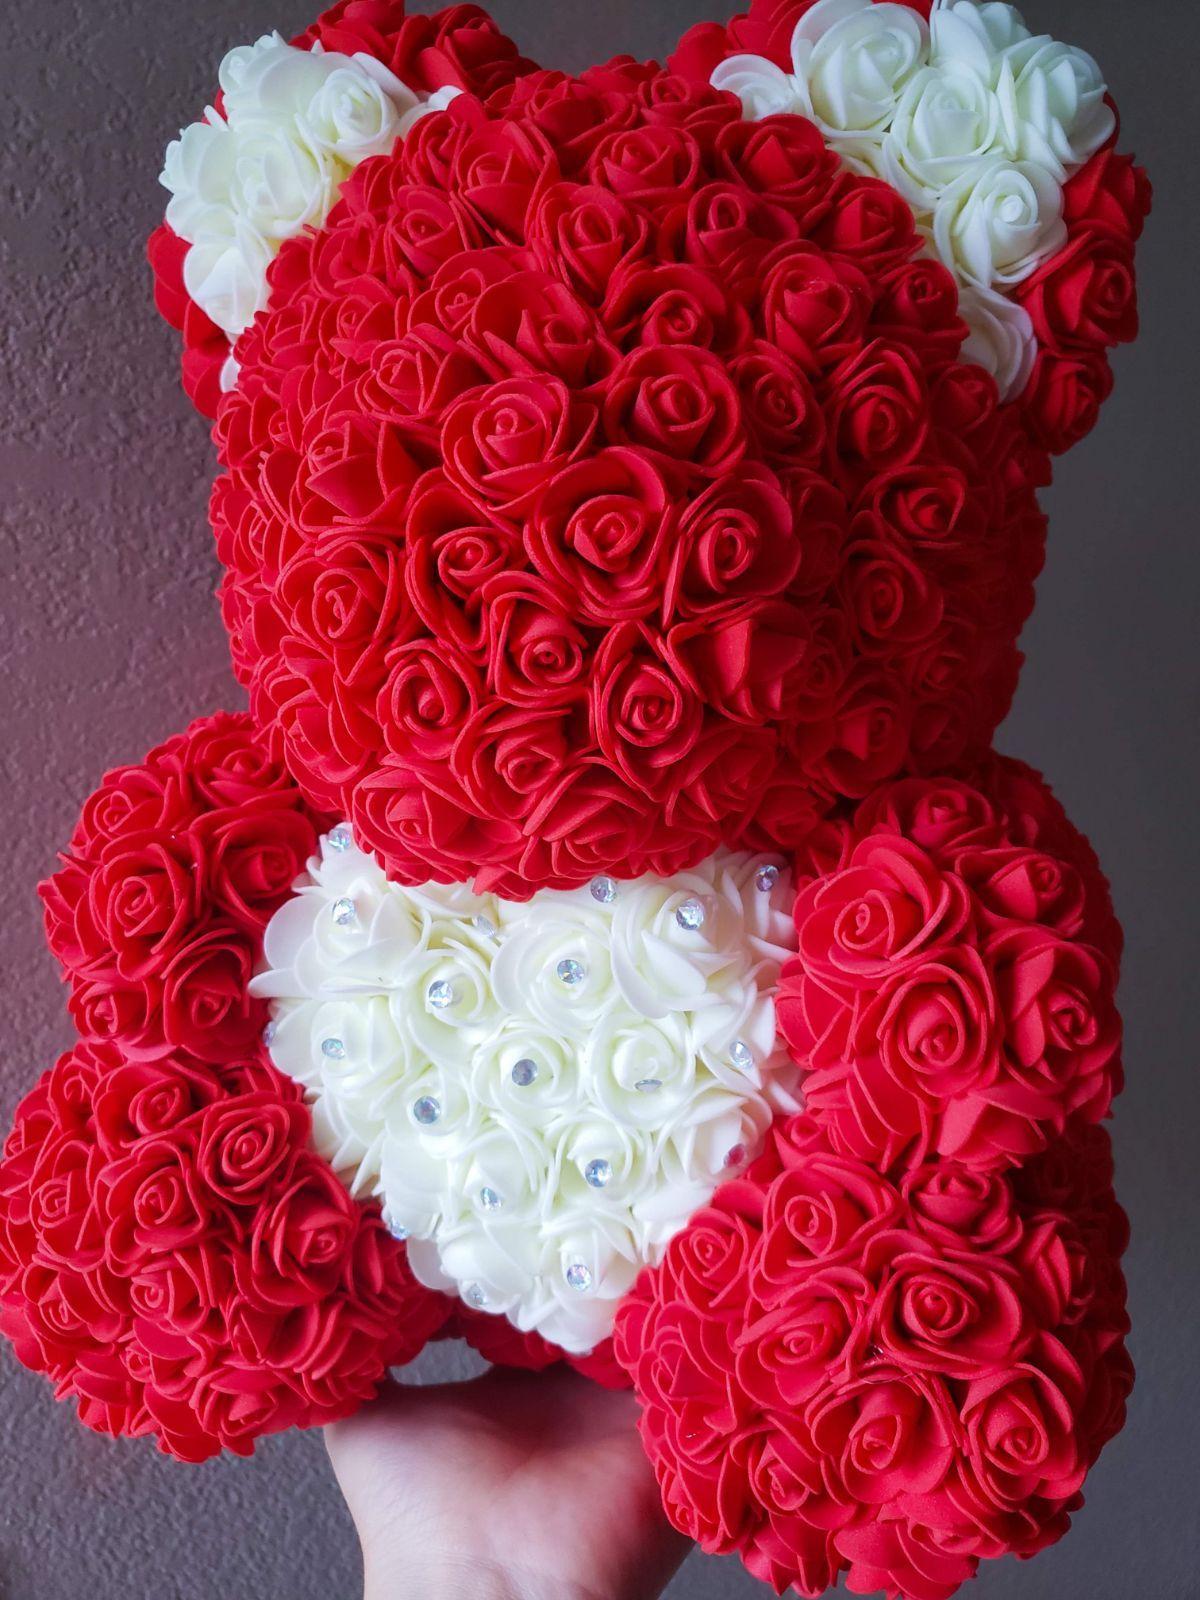 Bear Made Of Roses Singapore